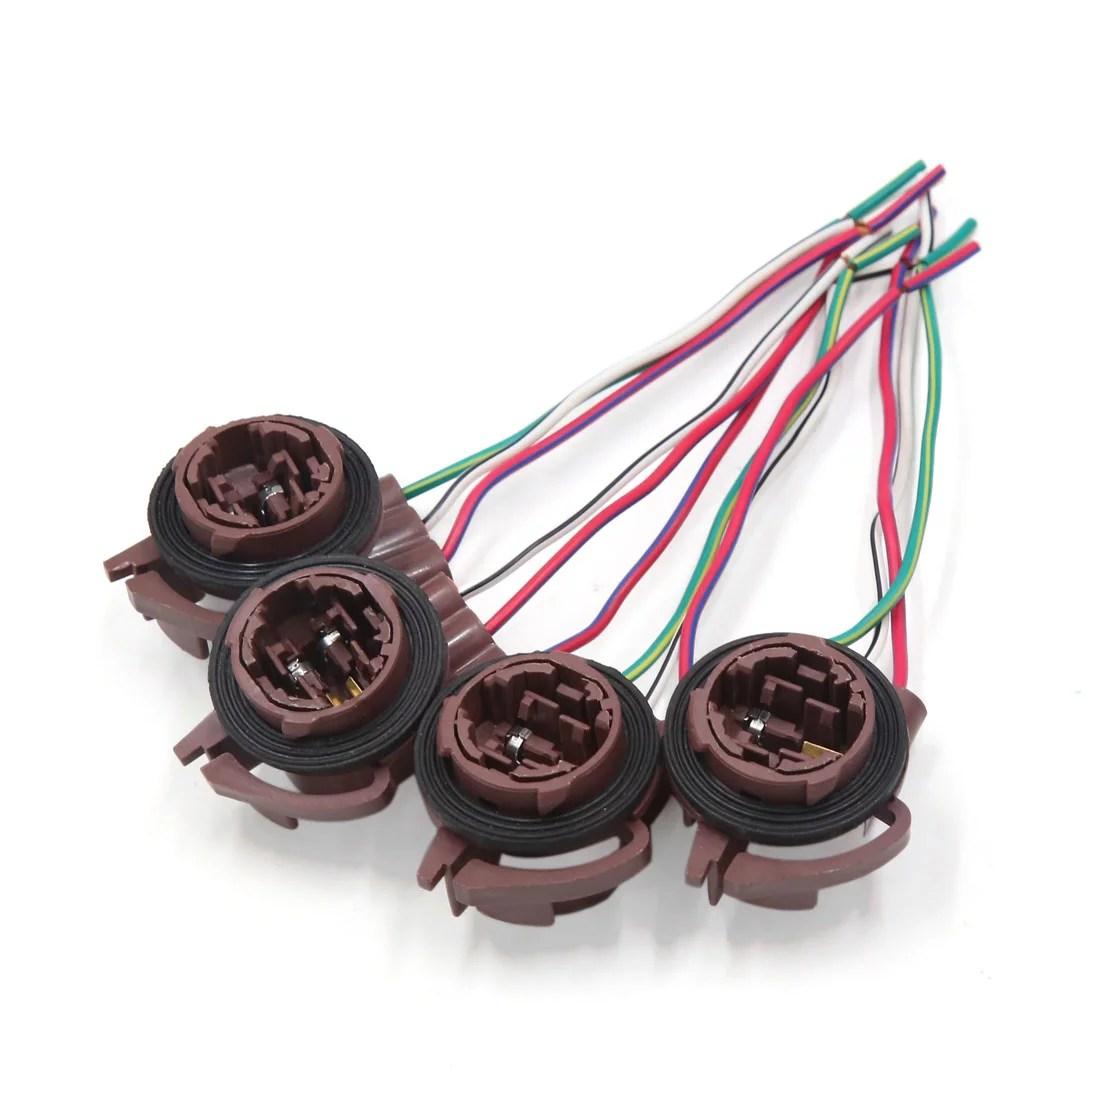 4pcs 3157 4157 brake light lamp bulb wiring harness socket connector for car walmart canada [ 1100 x 1100 Pixel ]